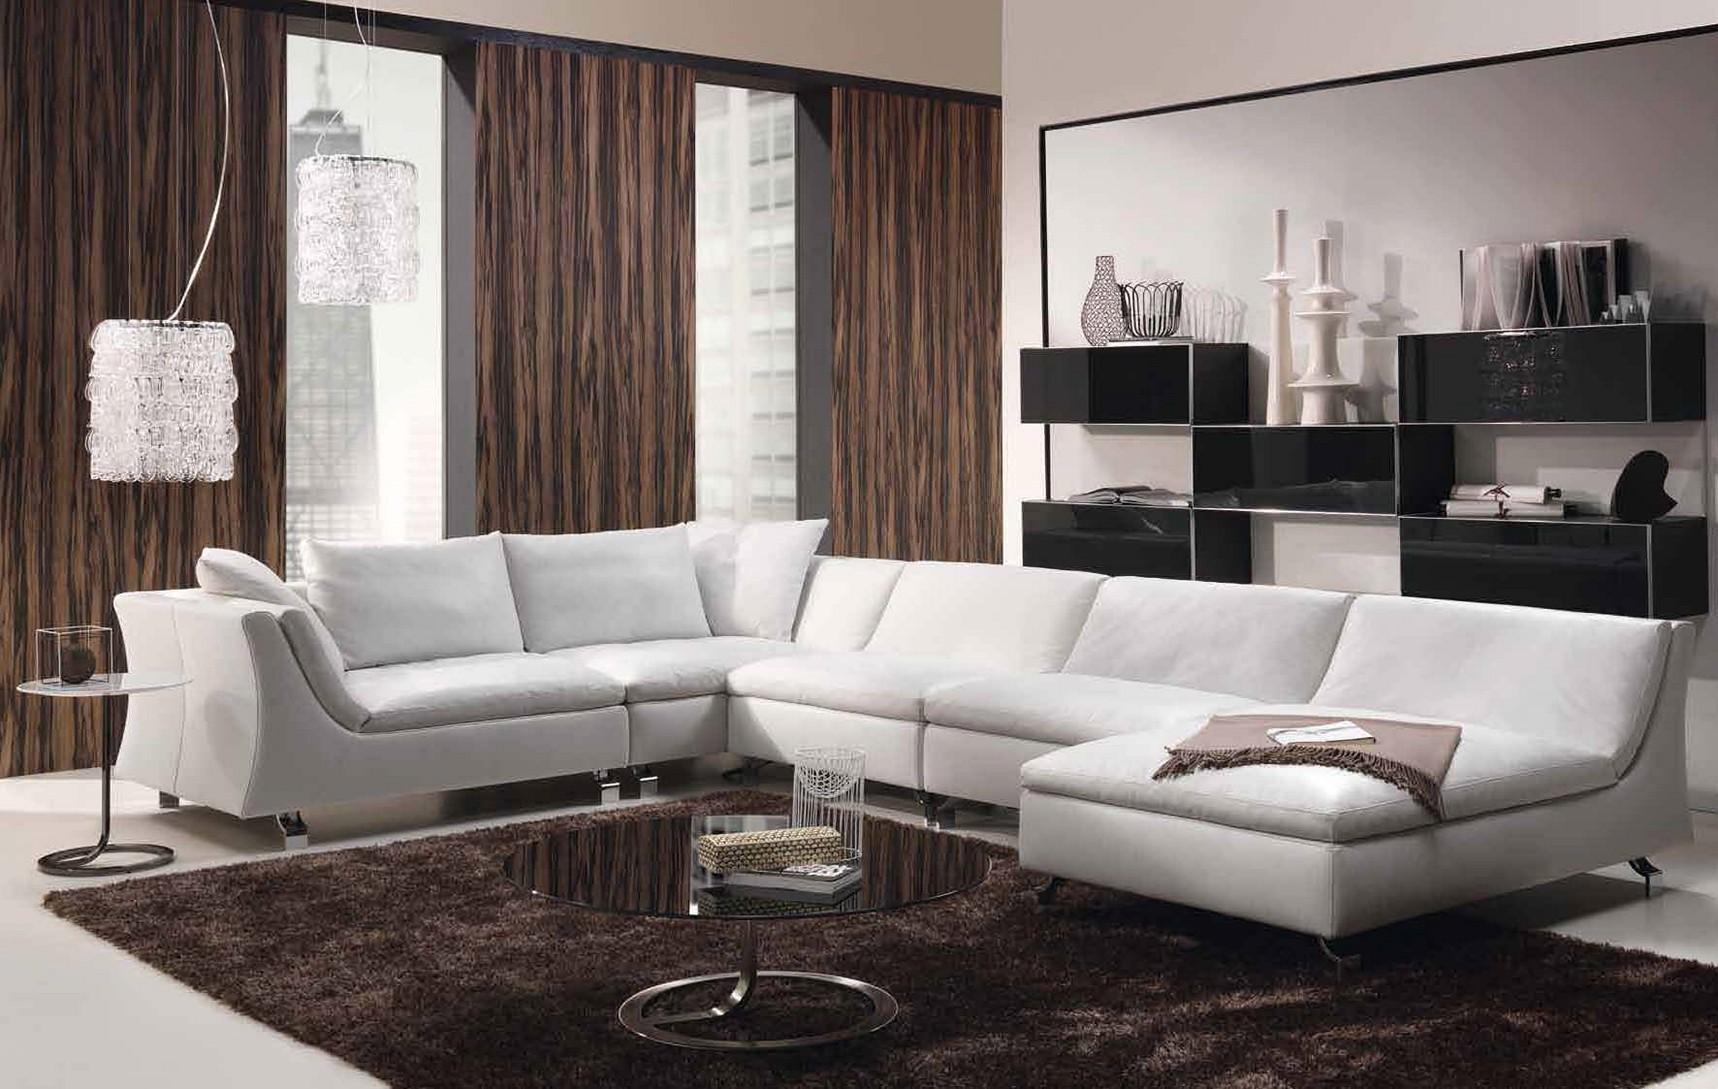 contemporary-living-room-furniture-ideas-2016